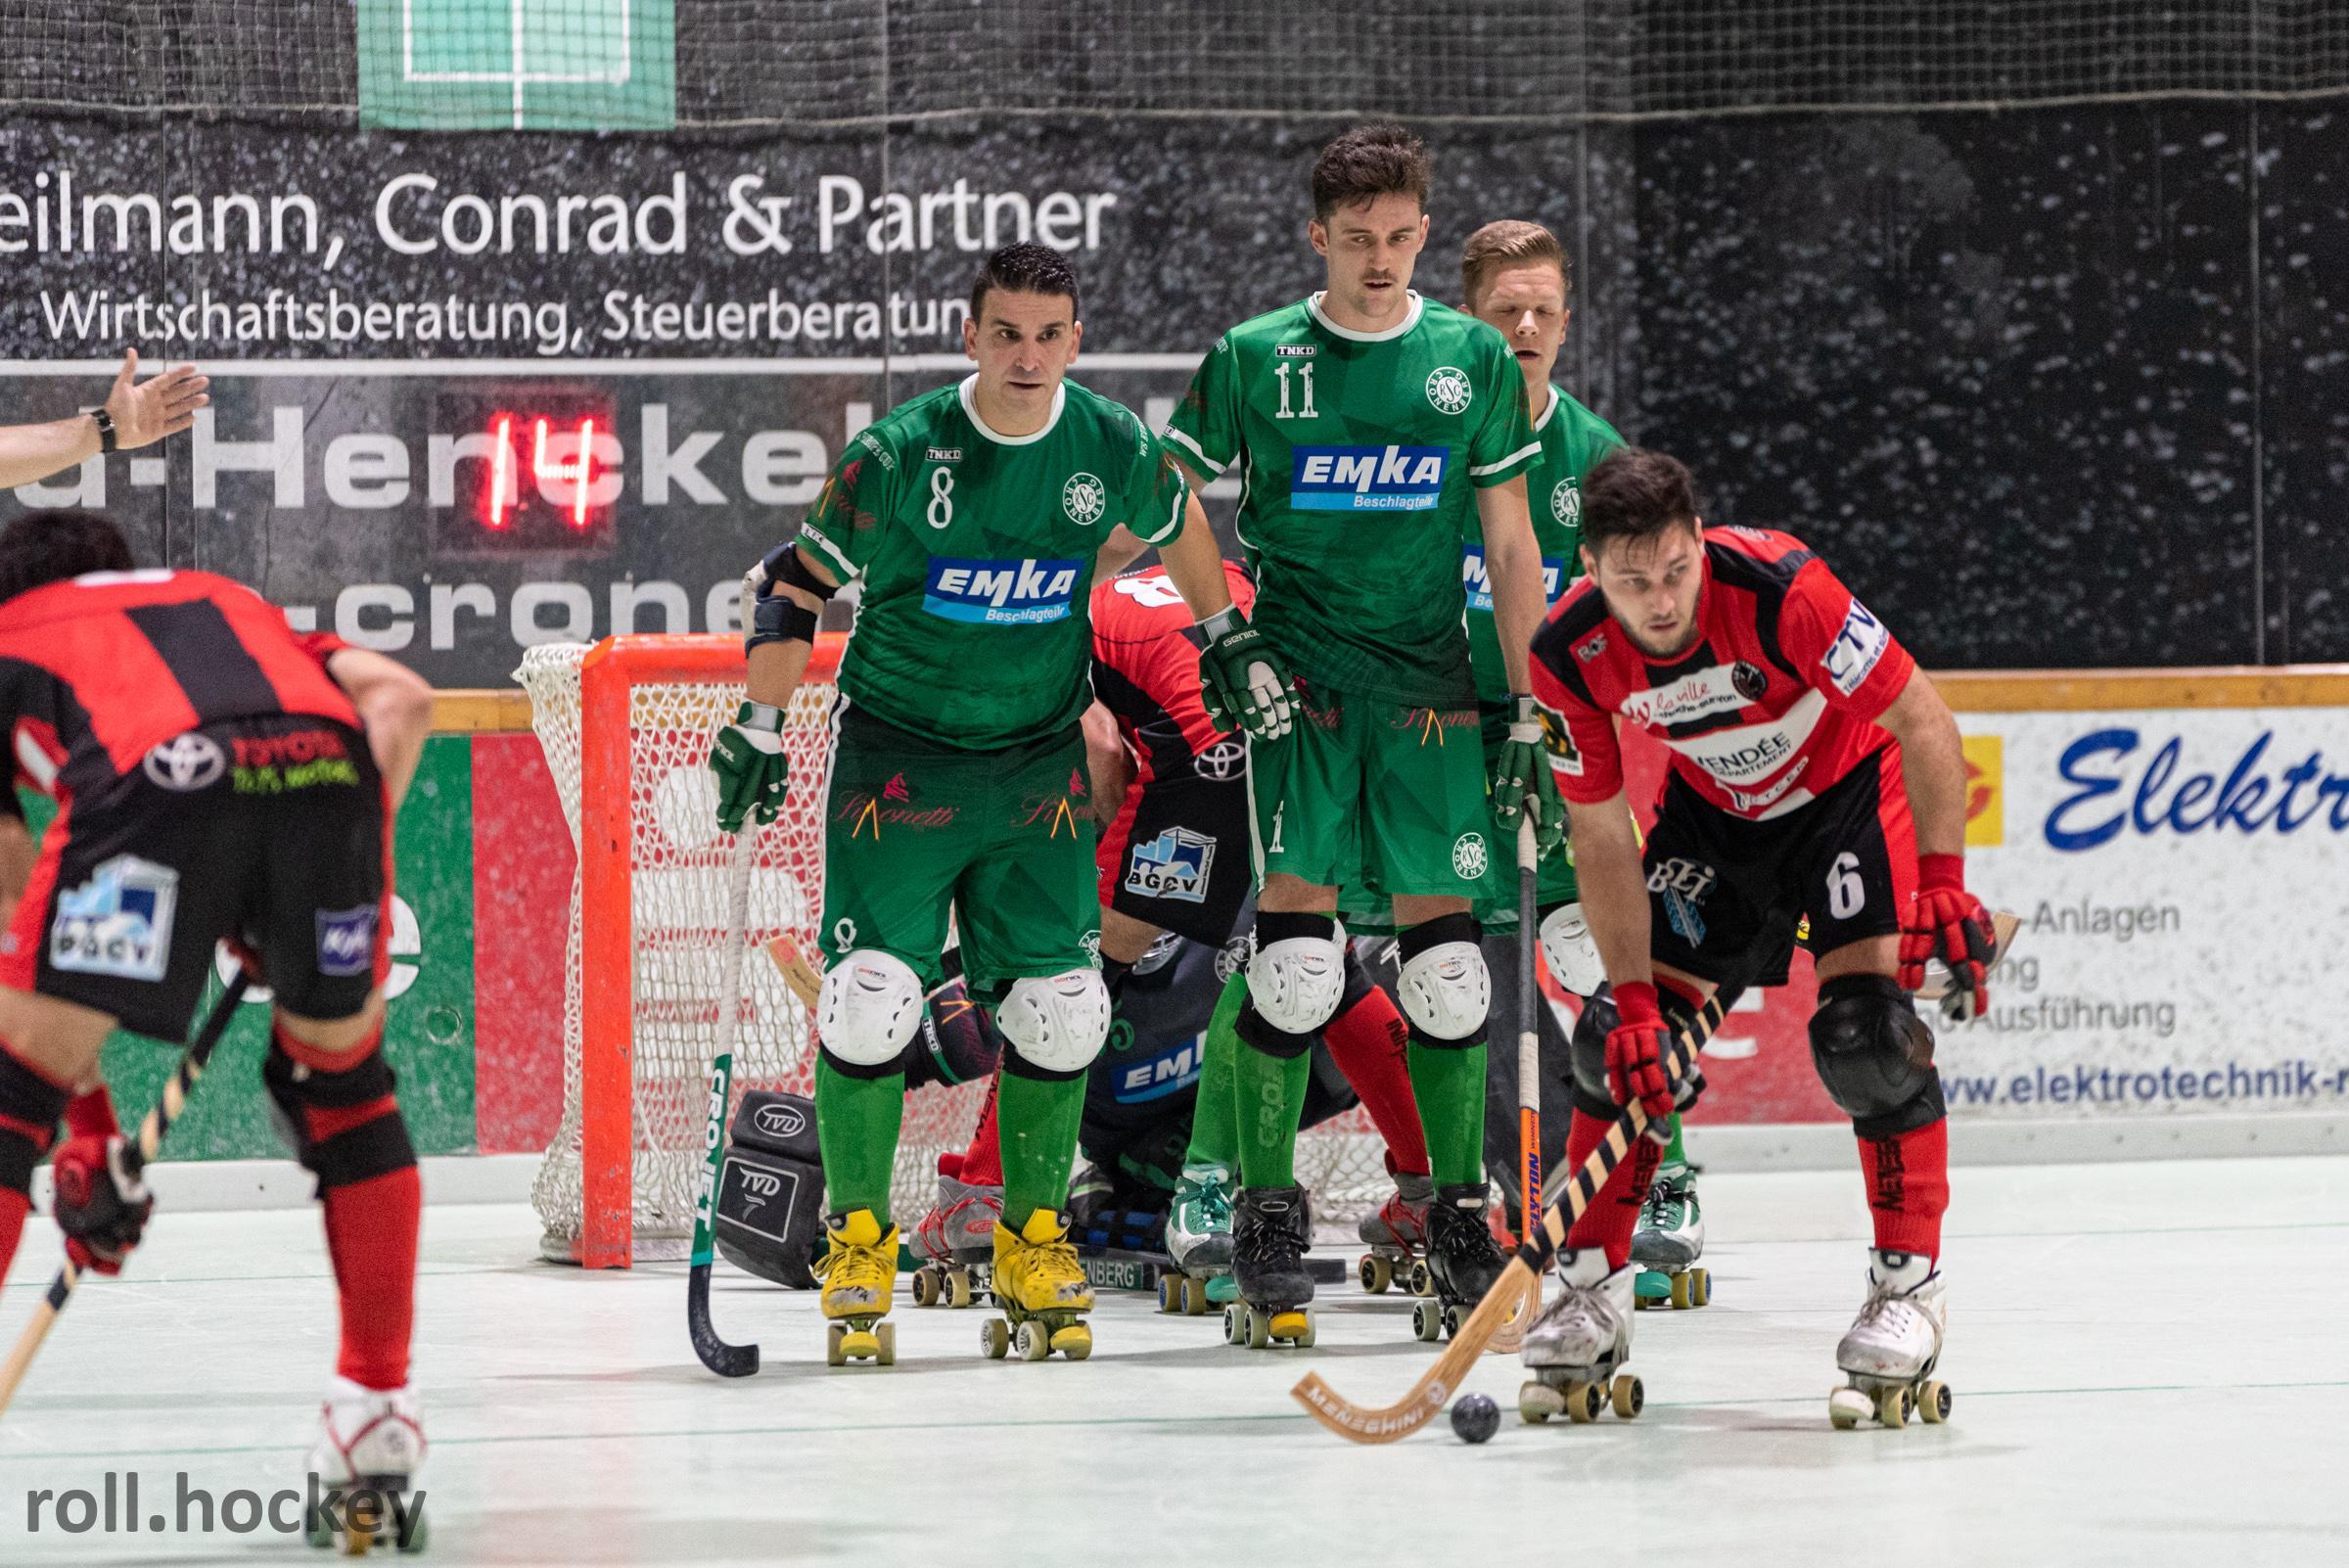 RSC Cronenberg Rollhockey Spieltag WS Europe Cup 16.11.2019